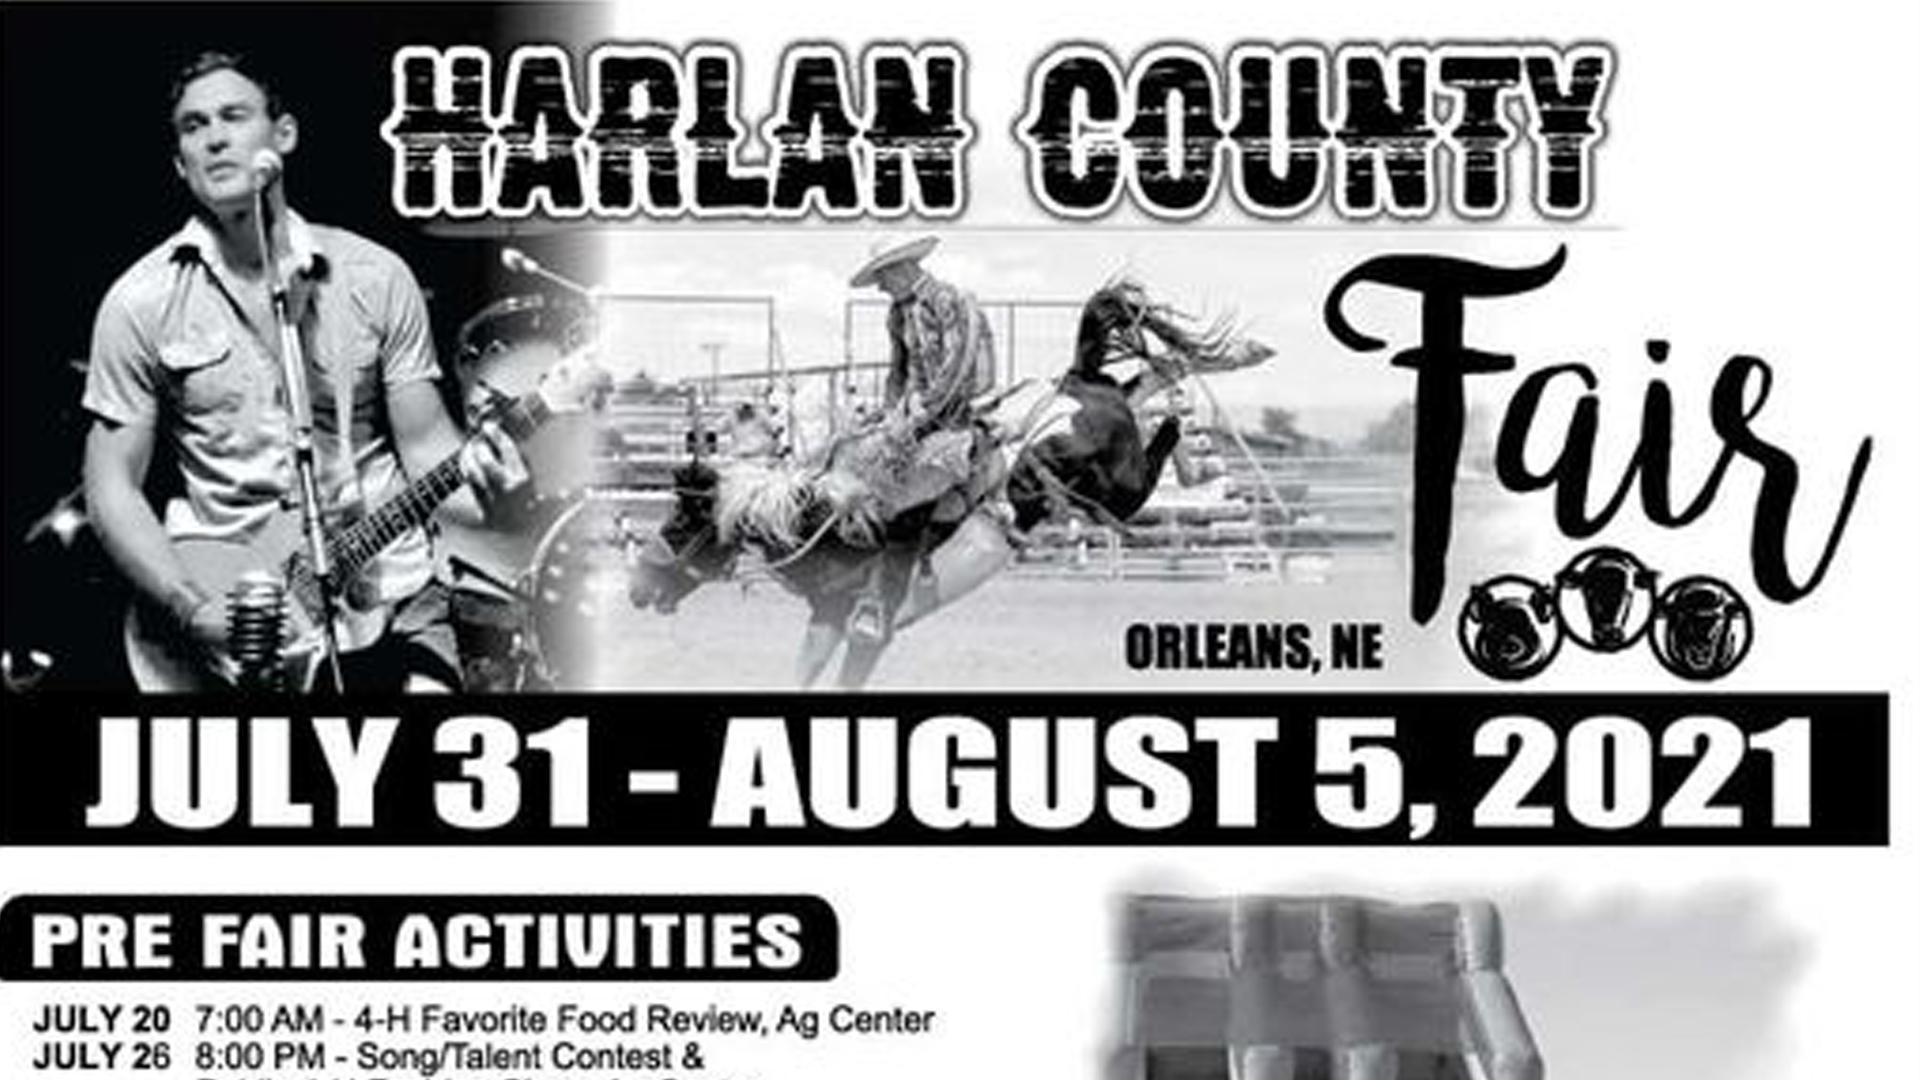 Harlan County Fair 2021